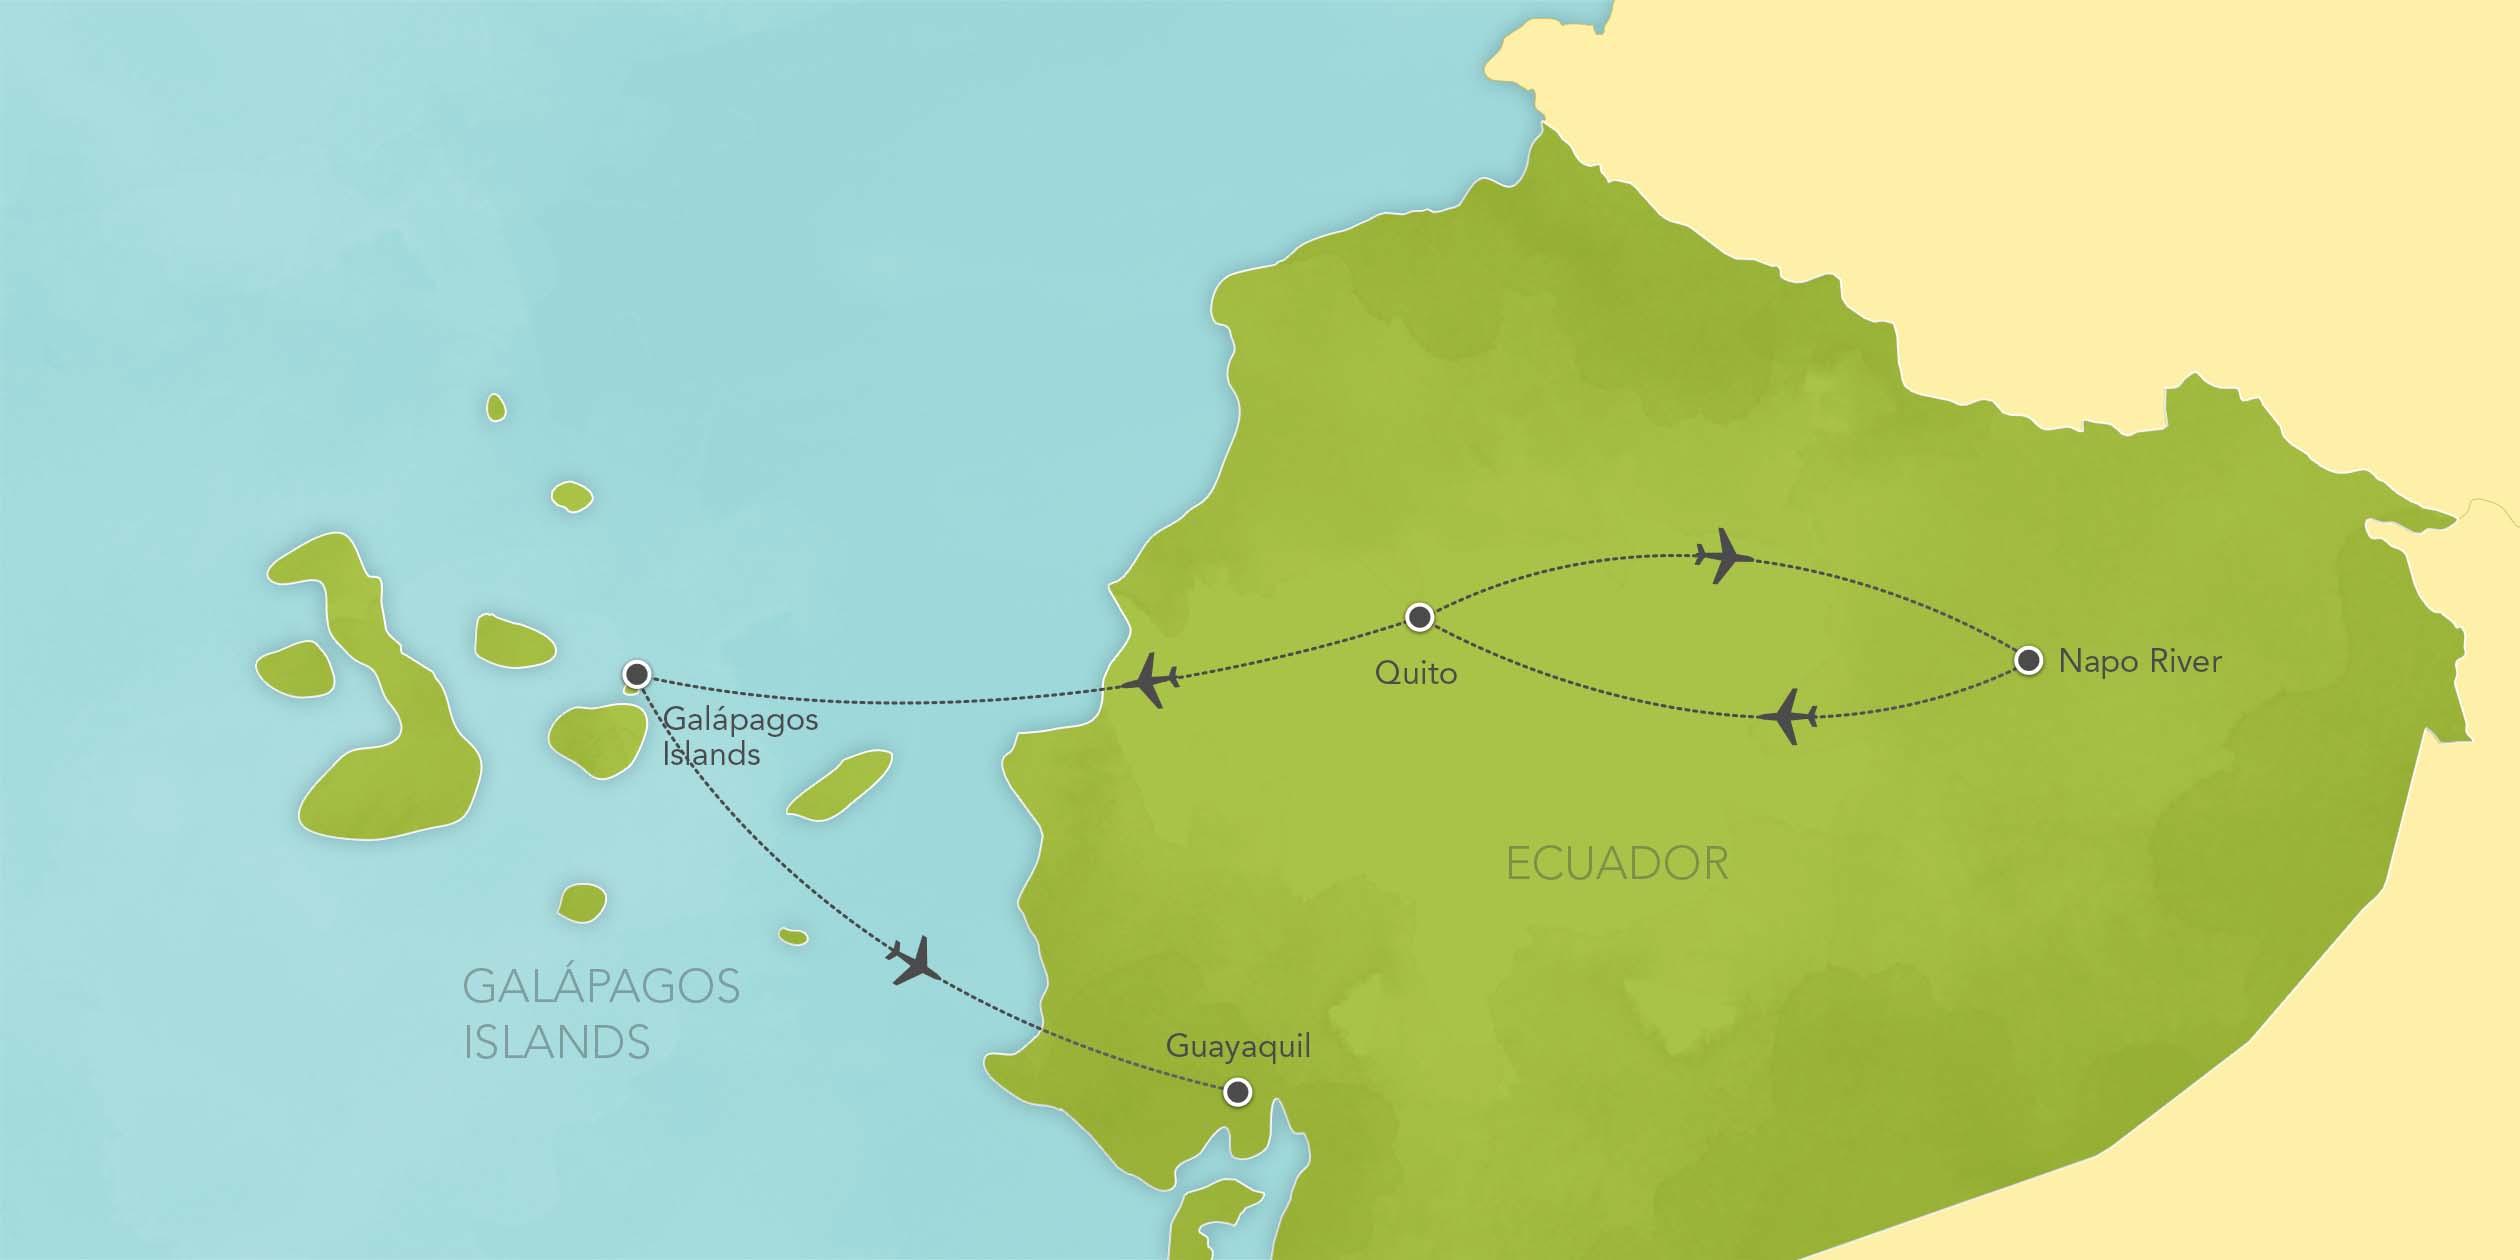 Itinerary map of Ecuador & Galápagos Islands: Quito, Yasuní National Park, Santa Cruz Island 2019